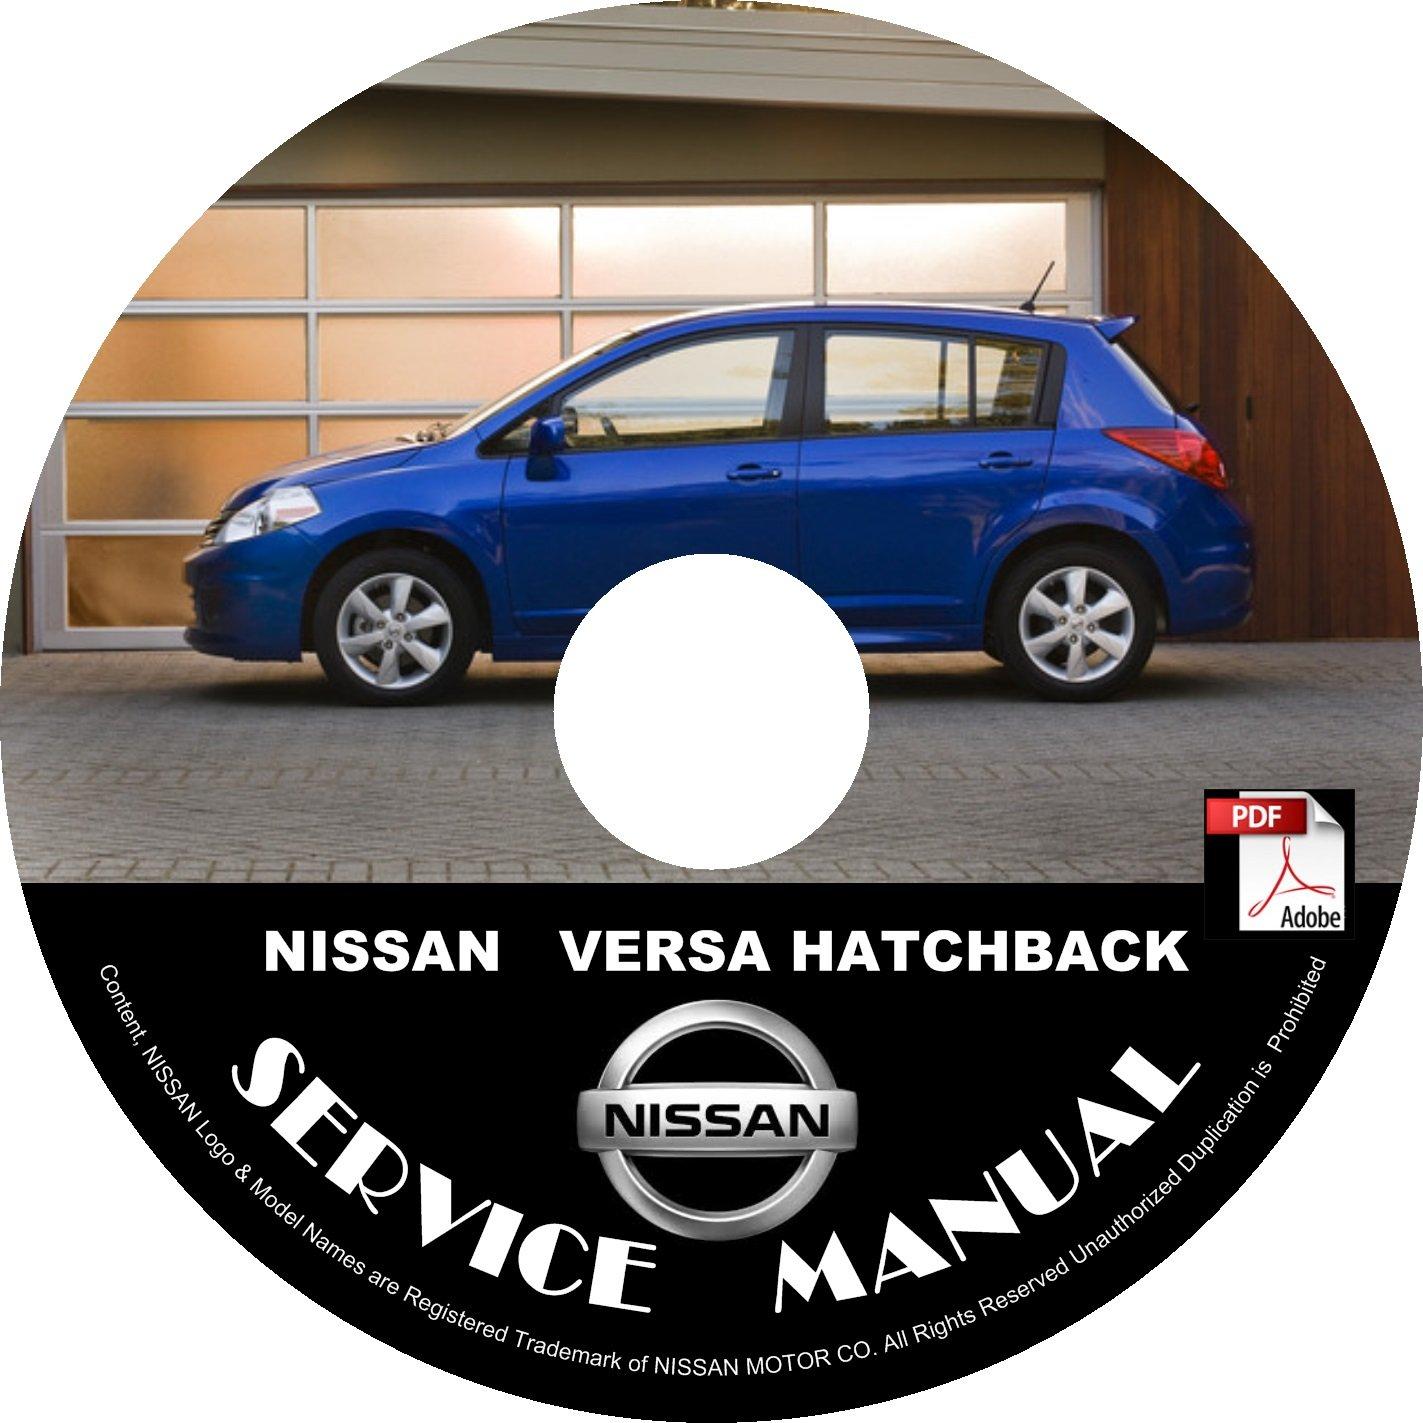 2009 Nissan Versa Hatchback Service Repair Shop Manual on CD